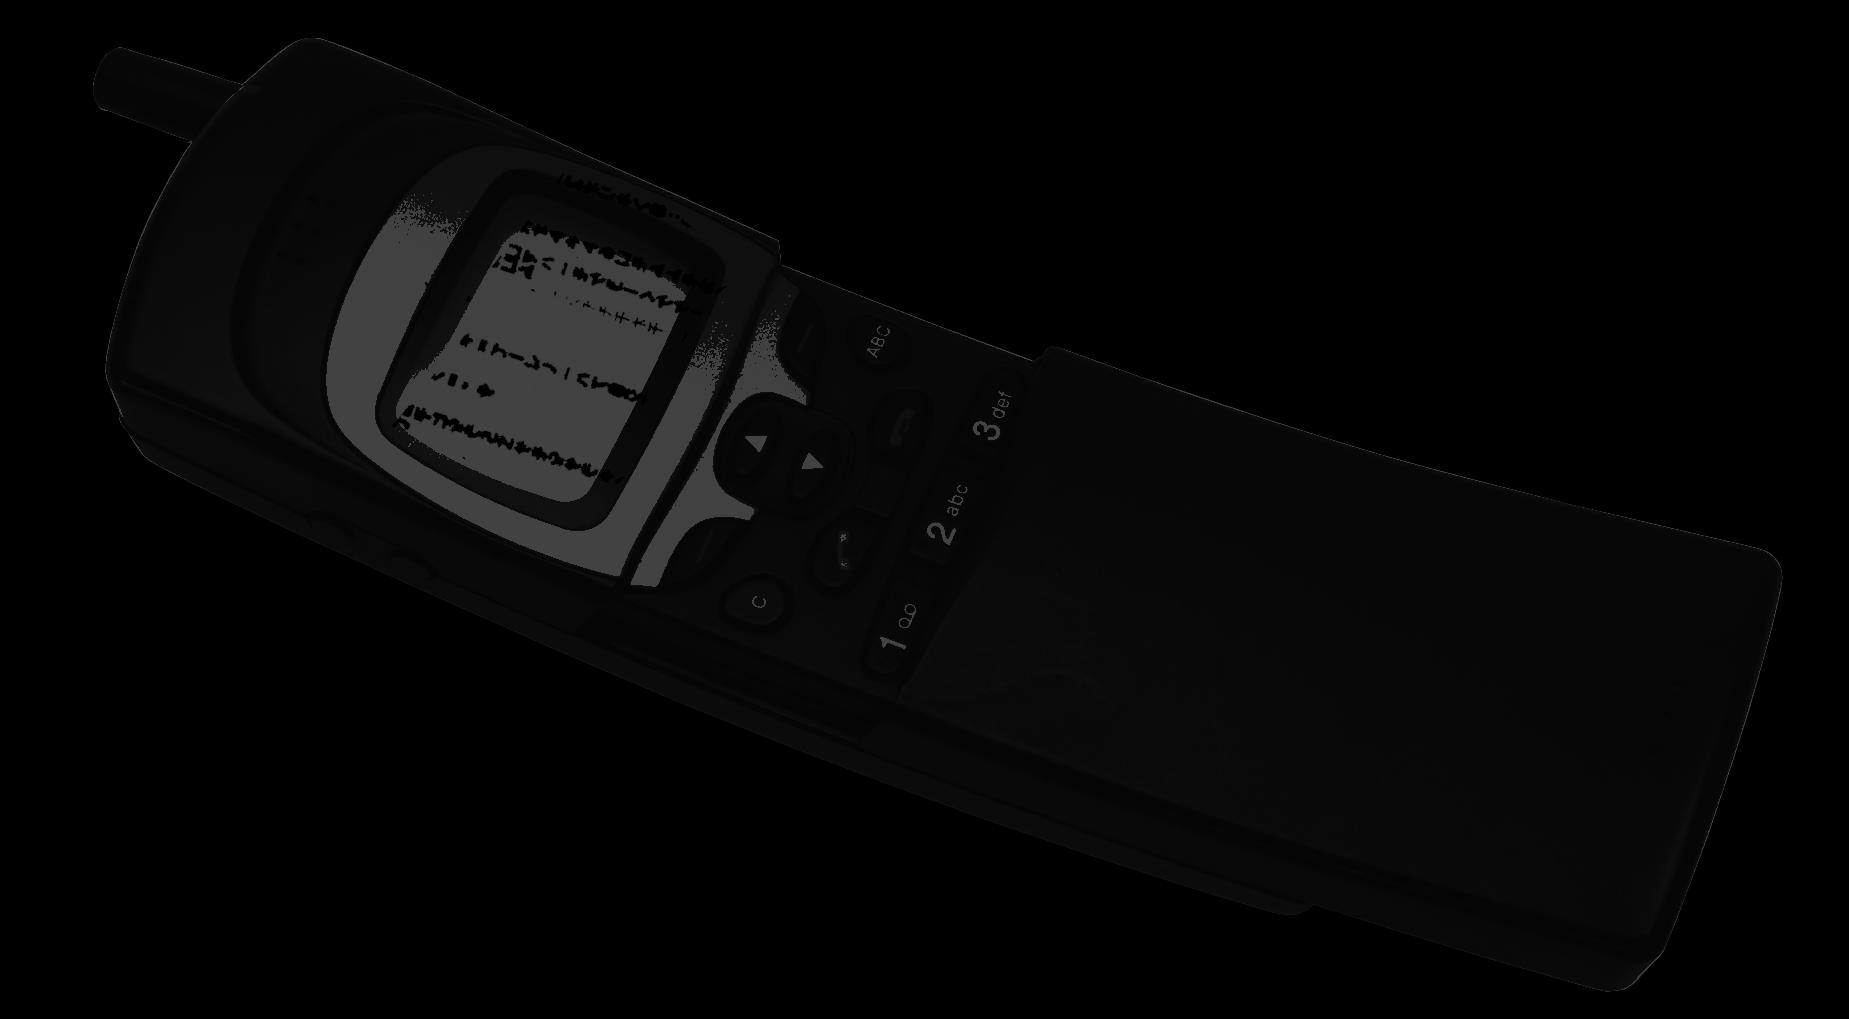 90s style flip phone